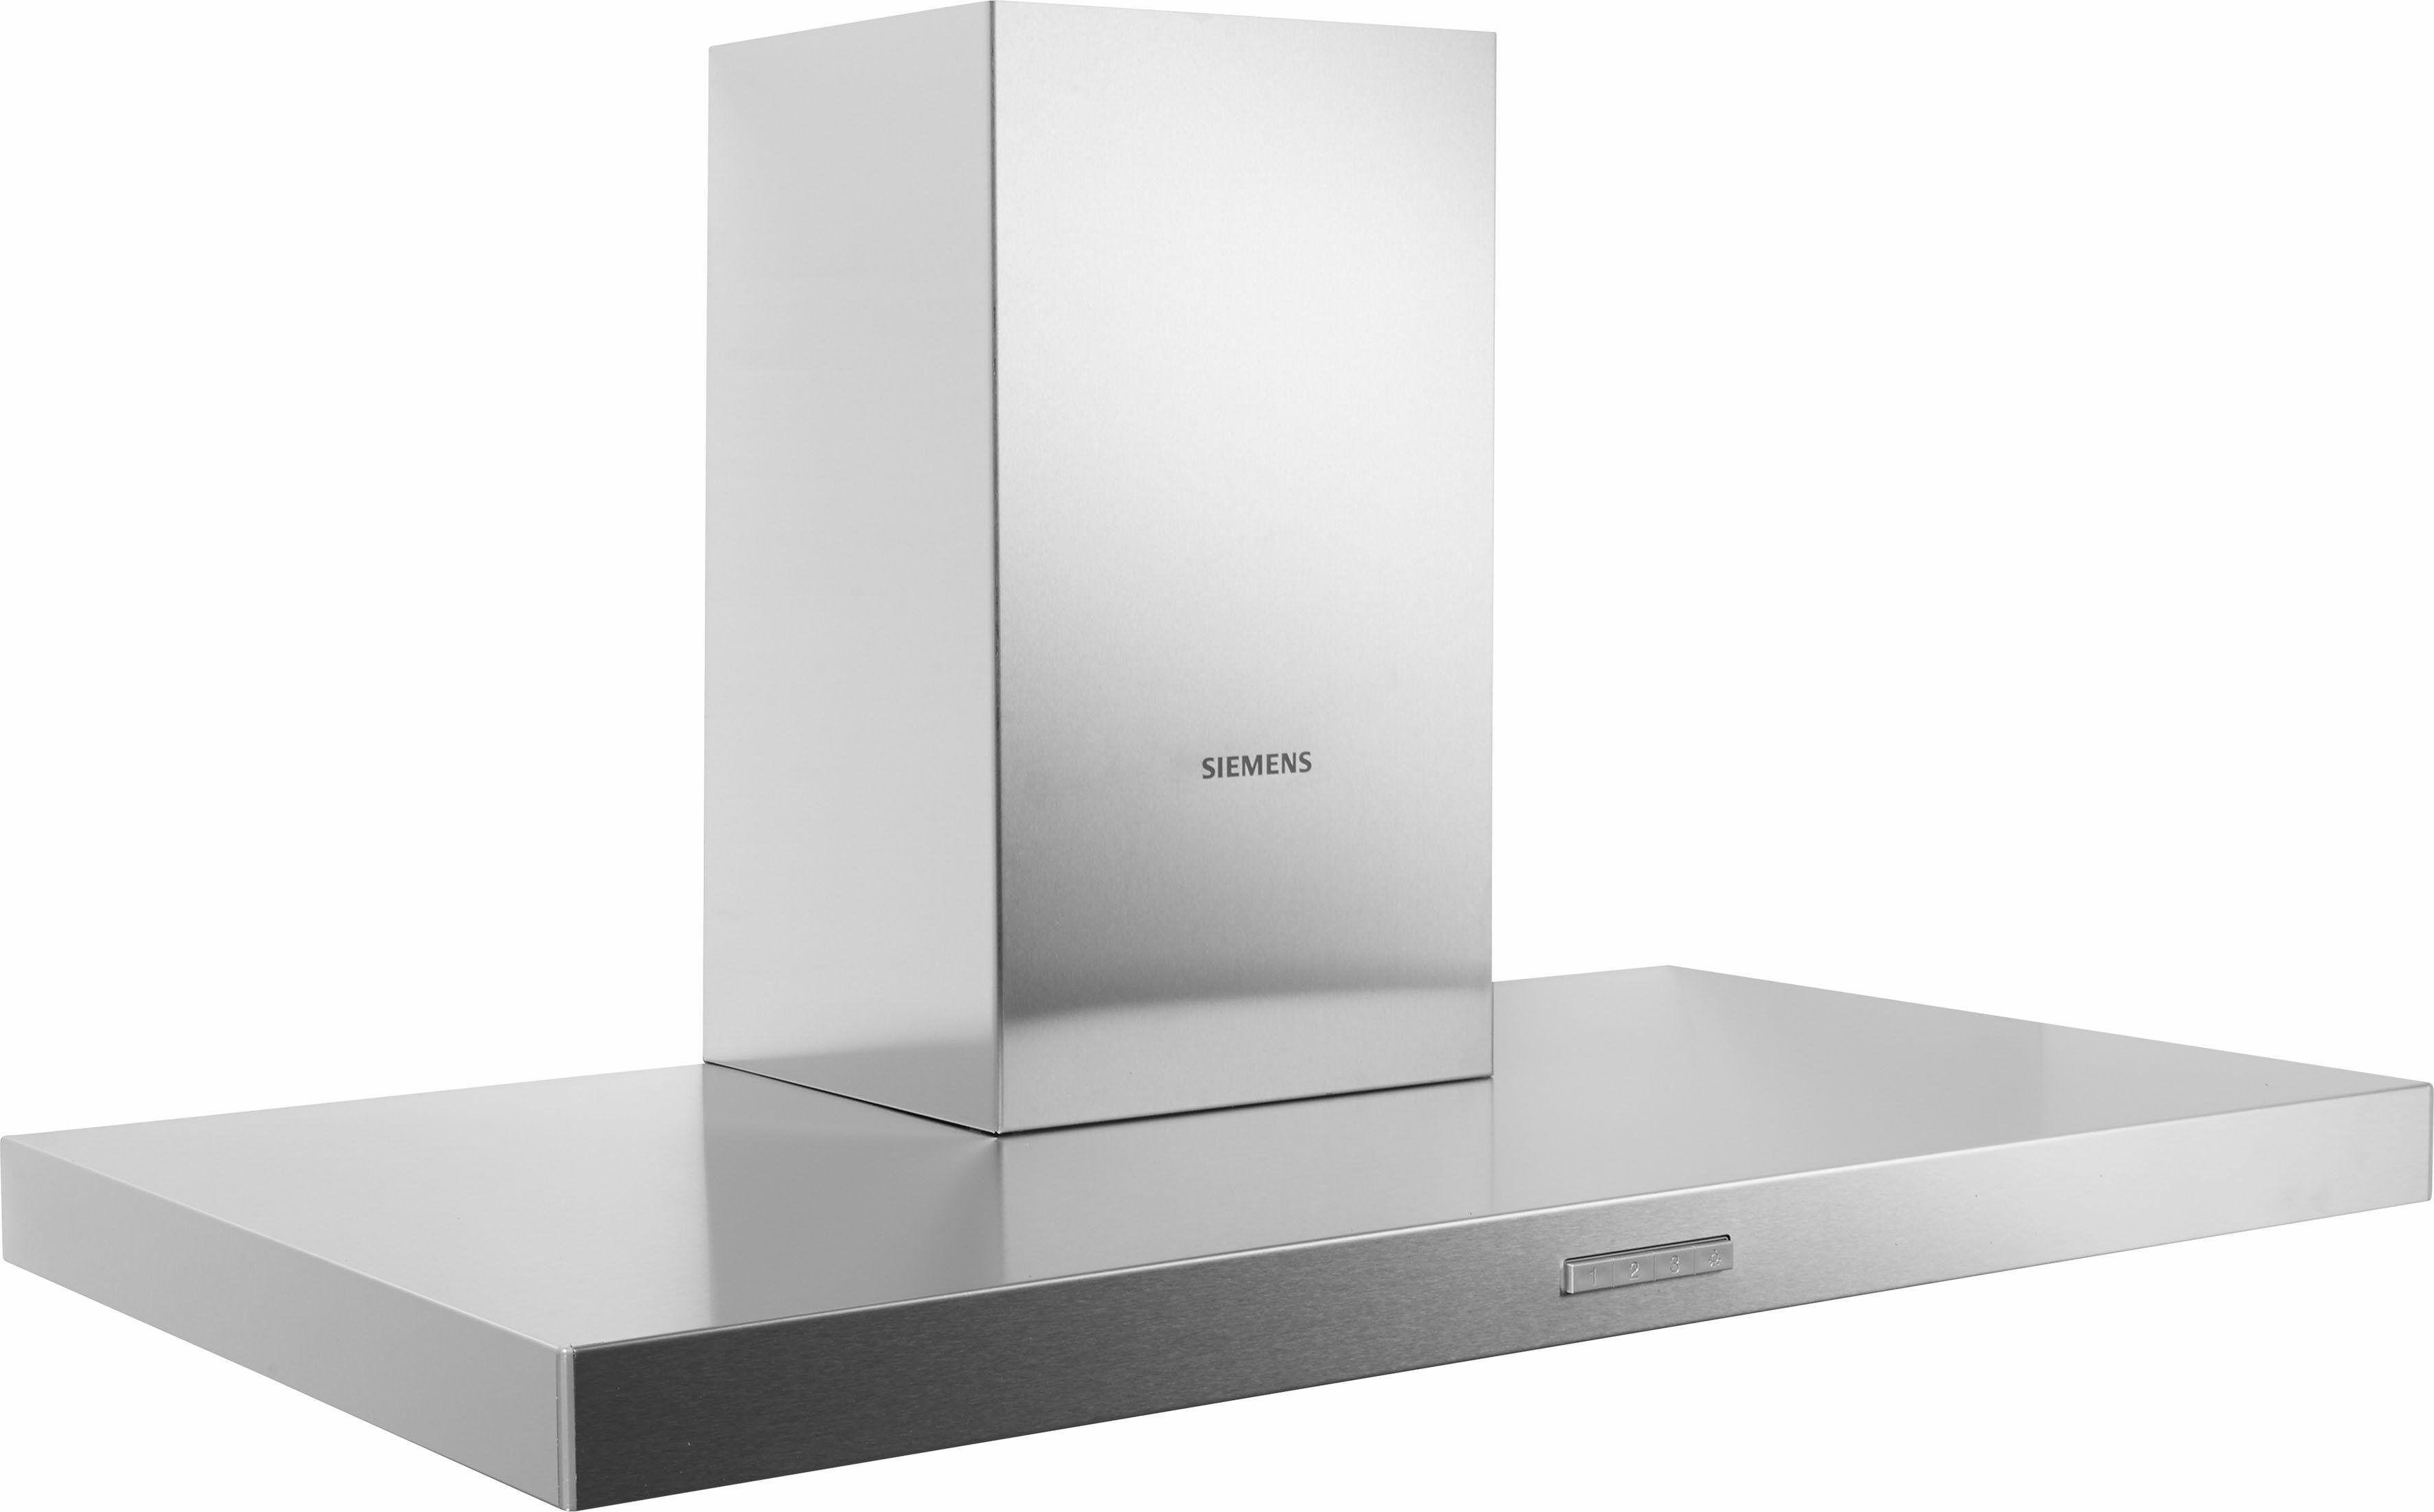 Siemens Wandhaube Serie iQ100 LC94BBC50, Energieeffizienzklasse D